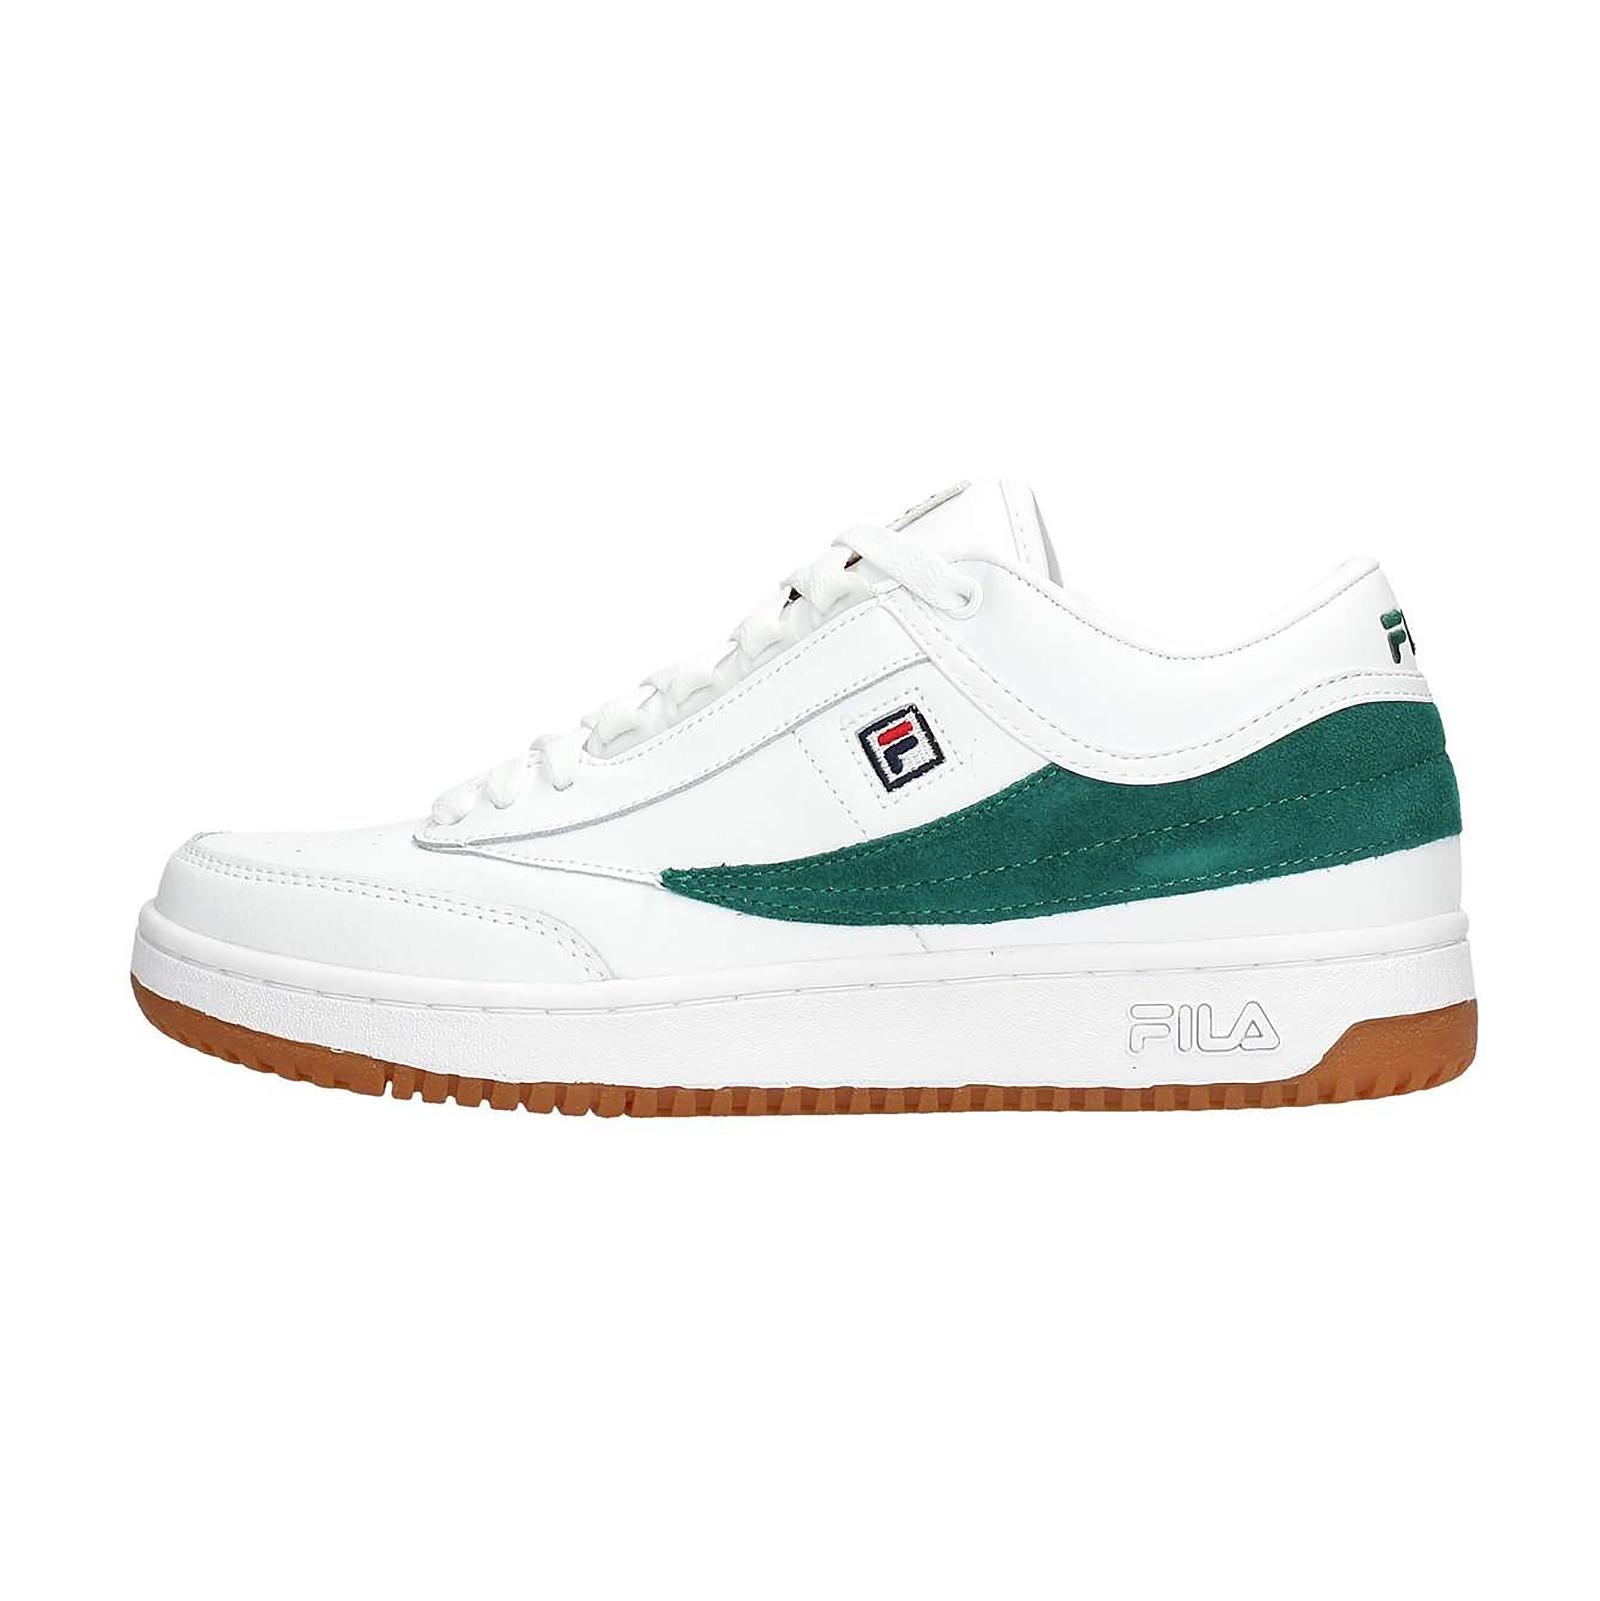 Fila Sneakers T1 Mid White / Shady Glade / Gum White